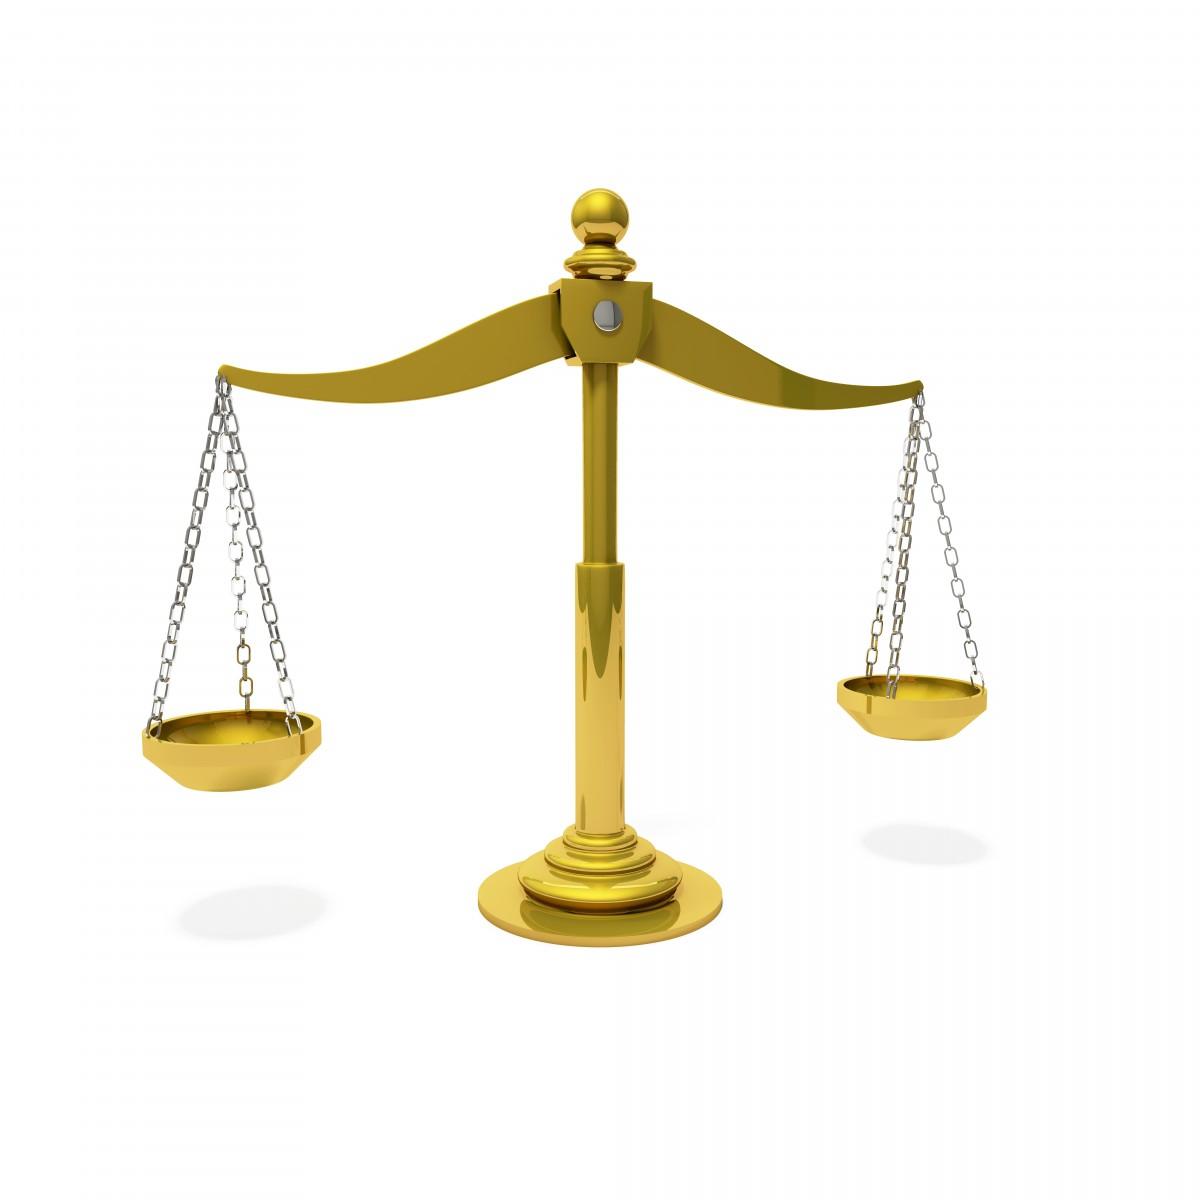 Free Images : Wood, Tool, Hammer, Symbol, Balance